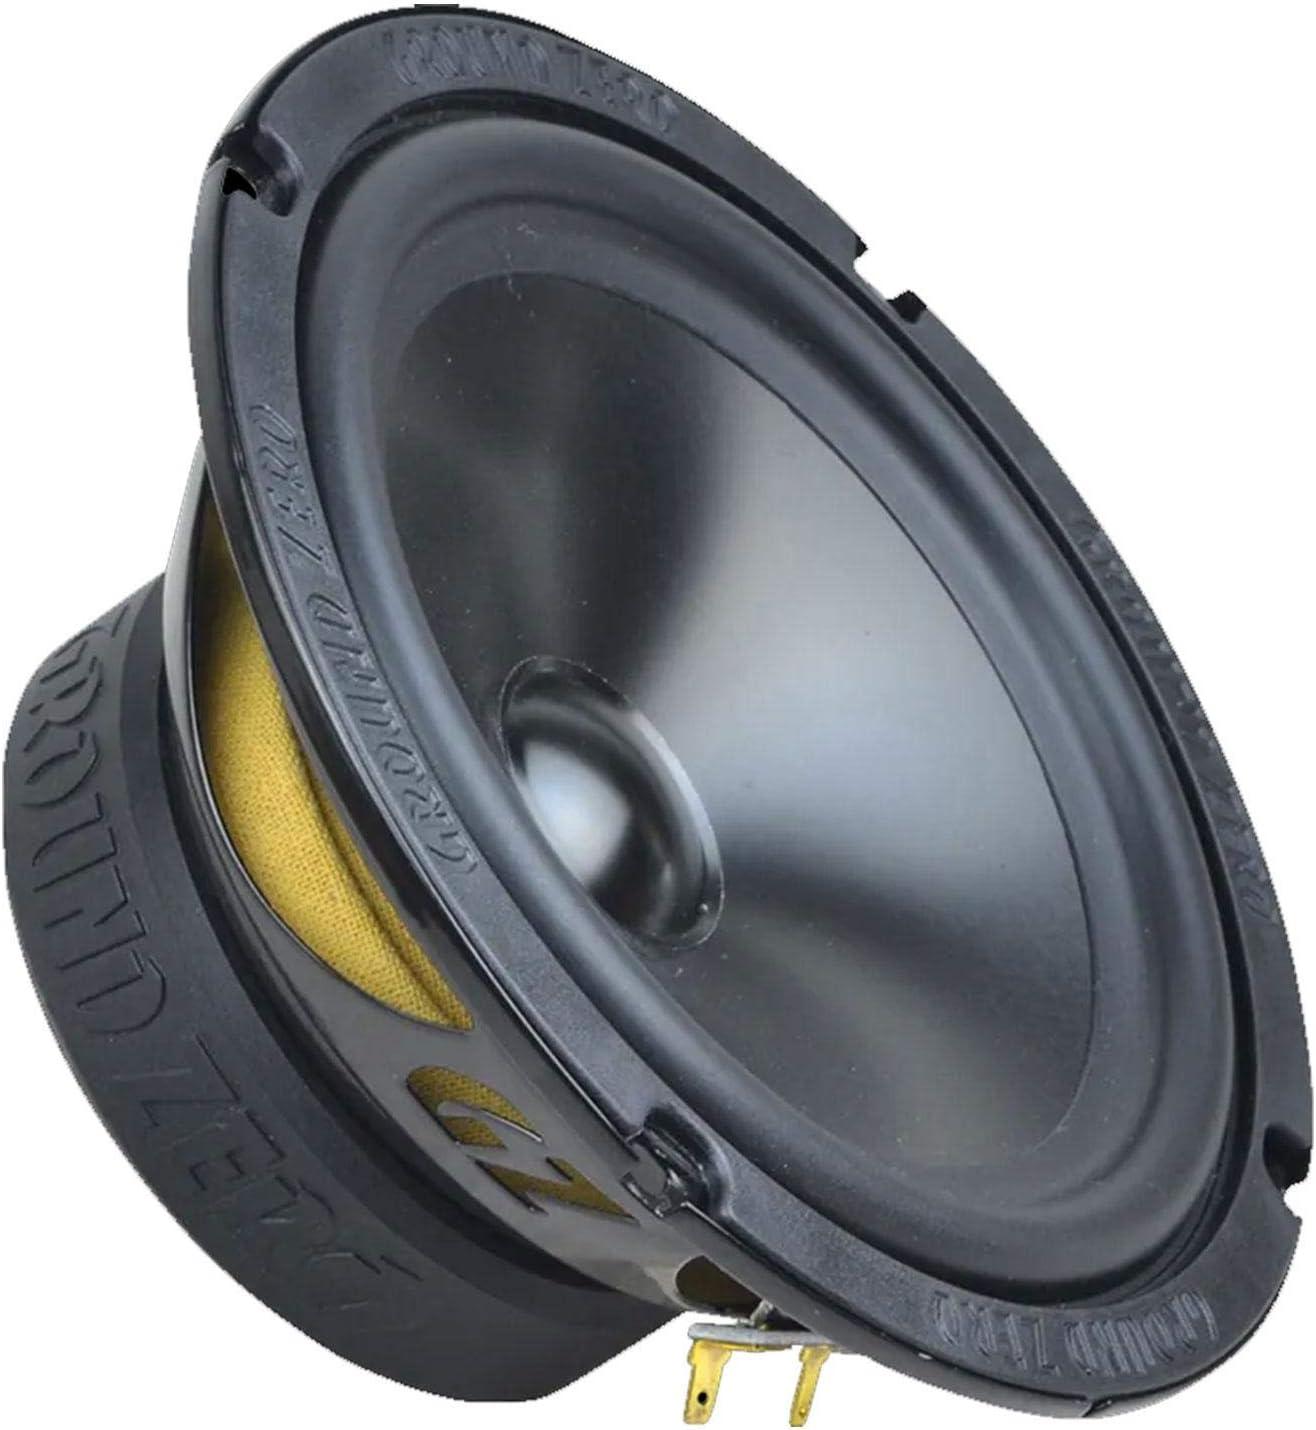 Ground Zero GZIC 16x Lautsprecher Einbau Set 165mm BMW MINI R50 R52 R53